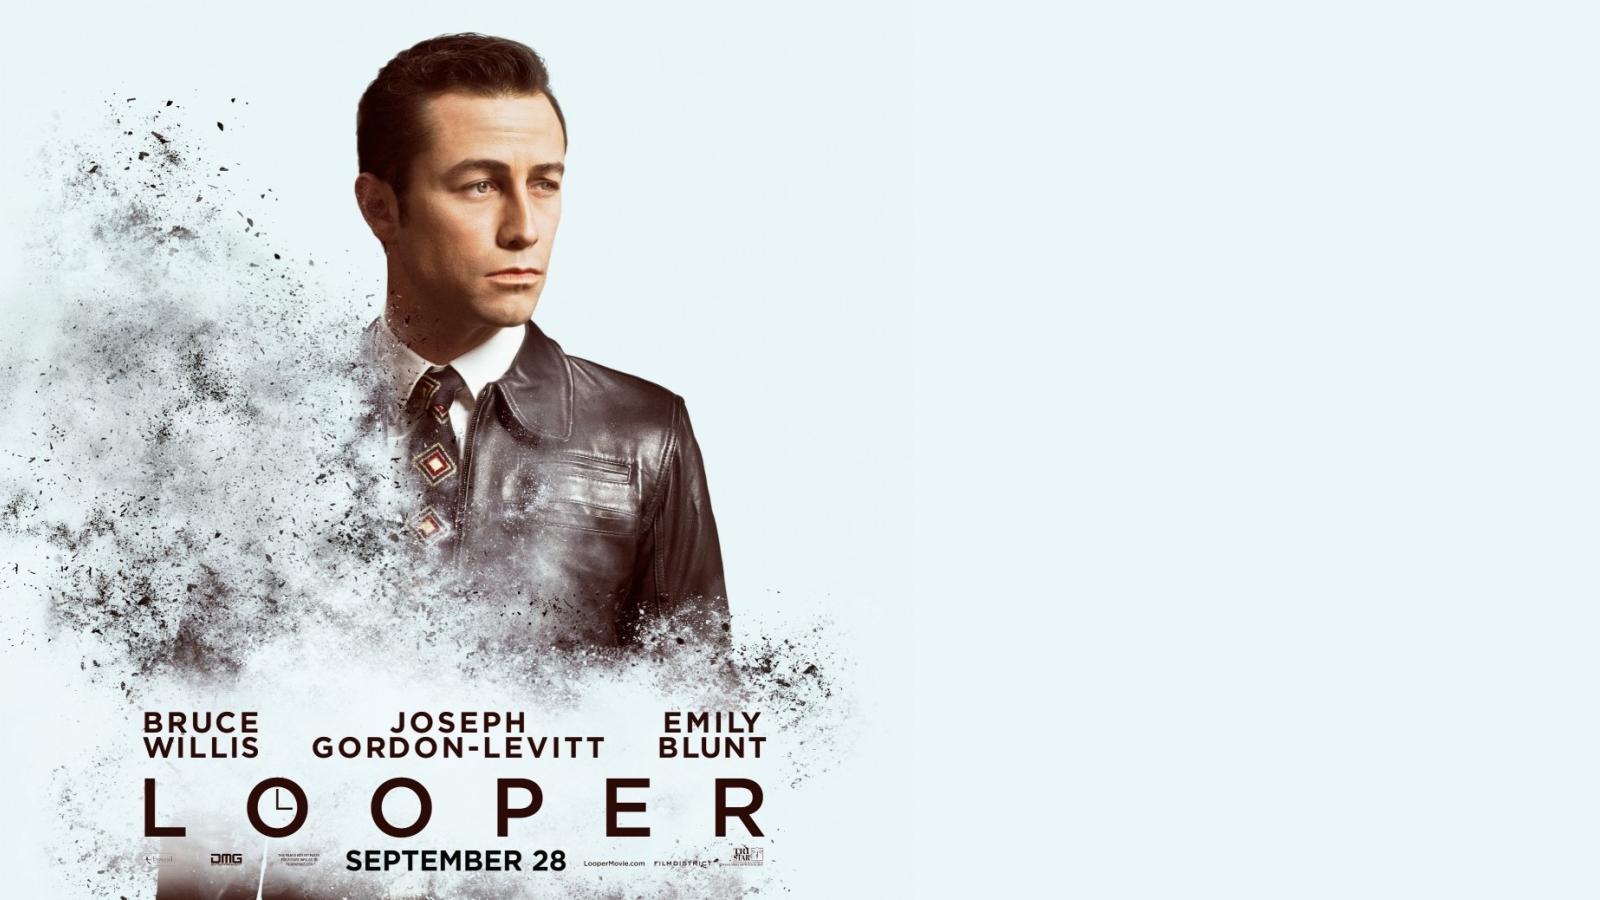 http://4.bp.blogspot.com/-pJUIiqBtlvA/UF3kF1JVsoI/AAAAAAAAQl0/71fwgTUAUKU/s1600/Looper_Movie_Wallpaper.jpg